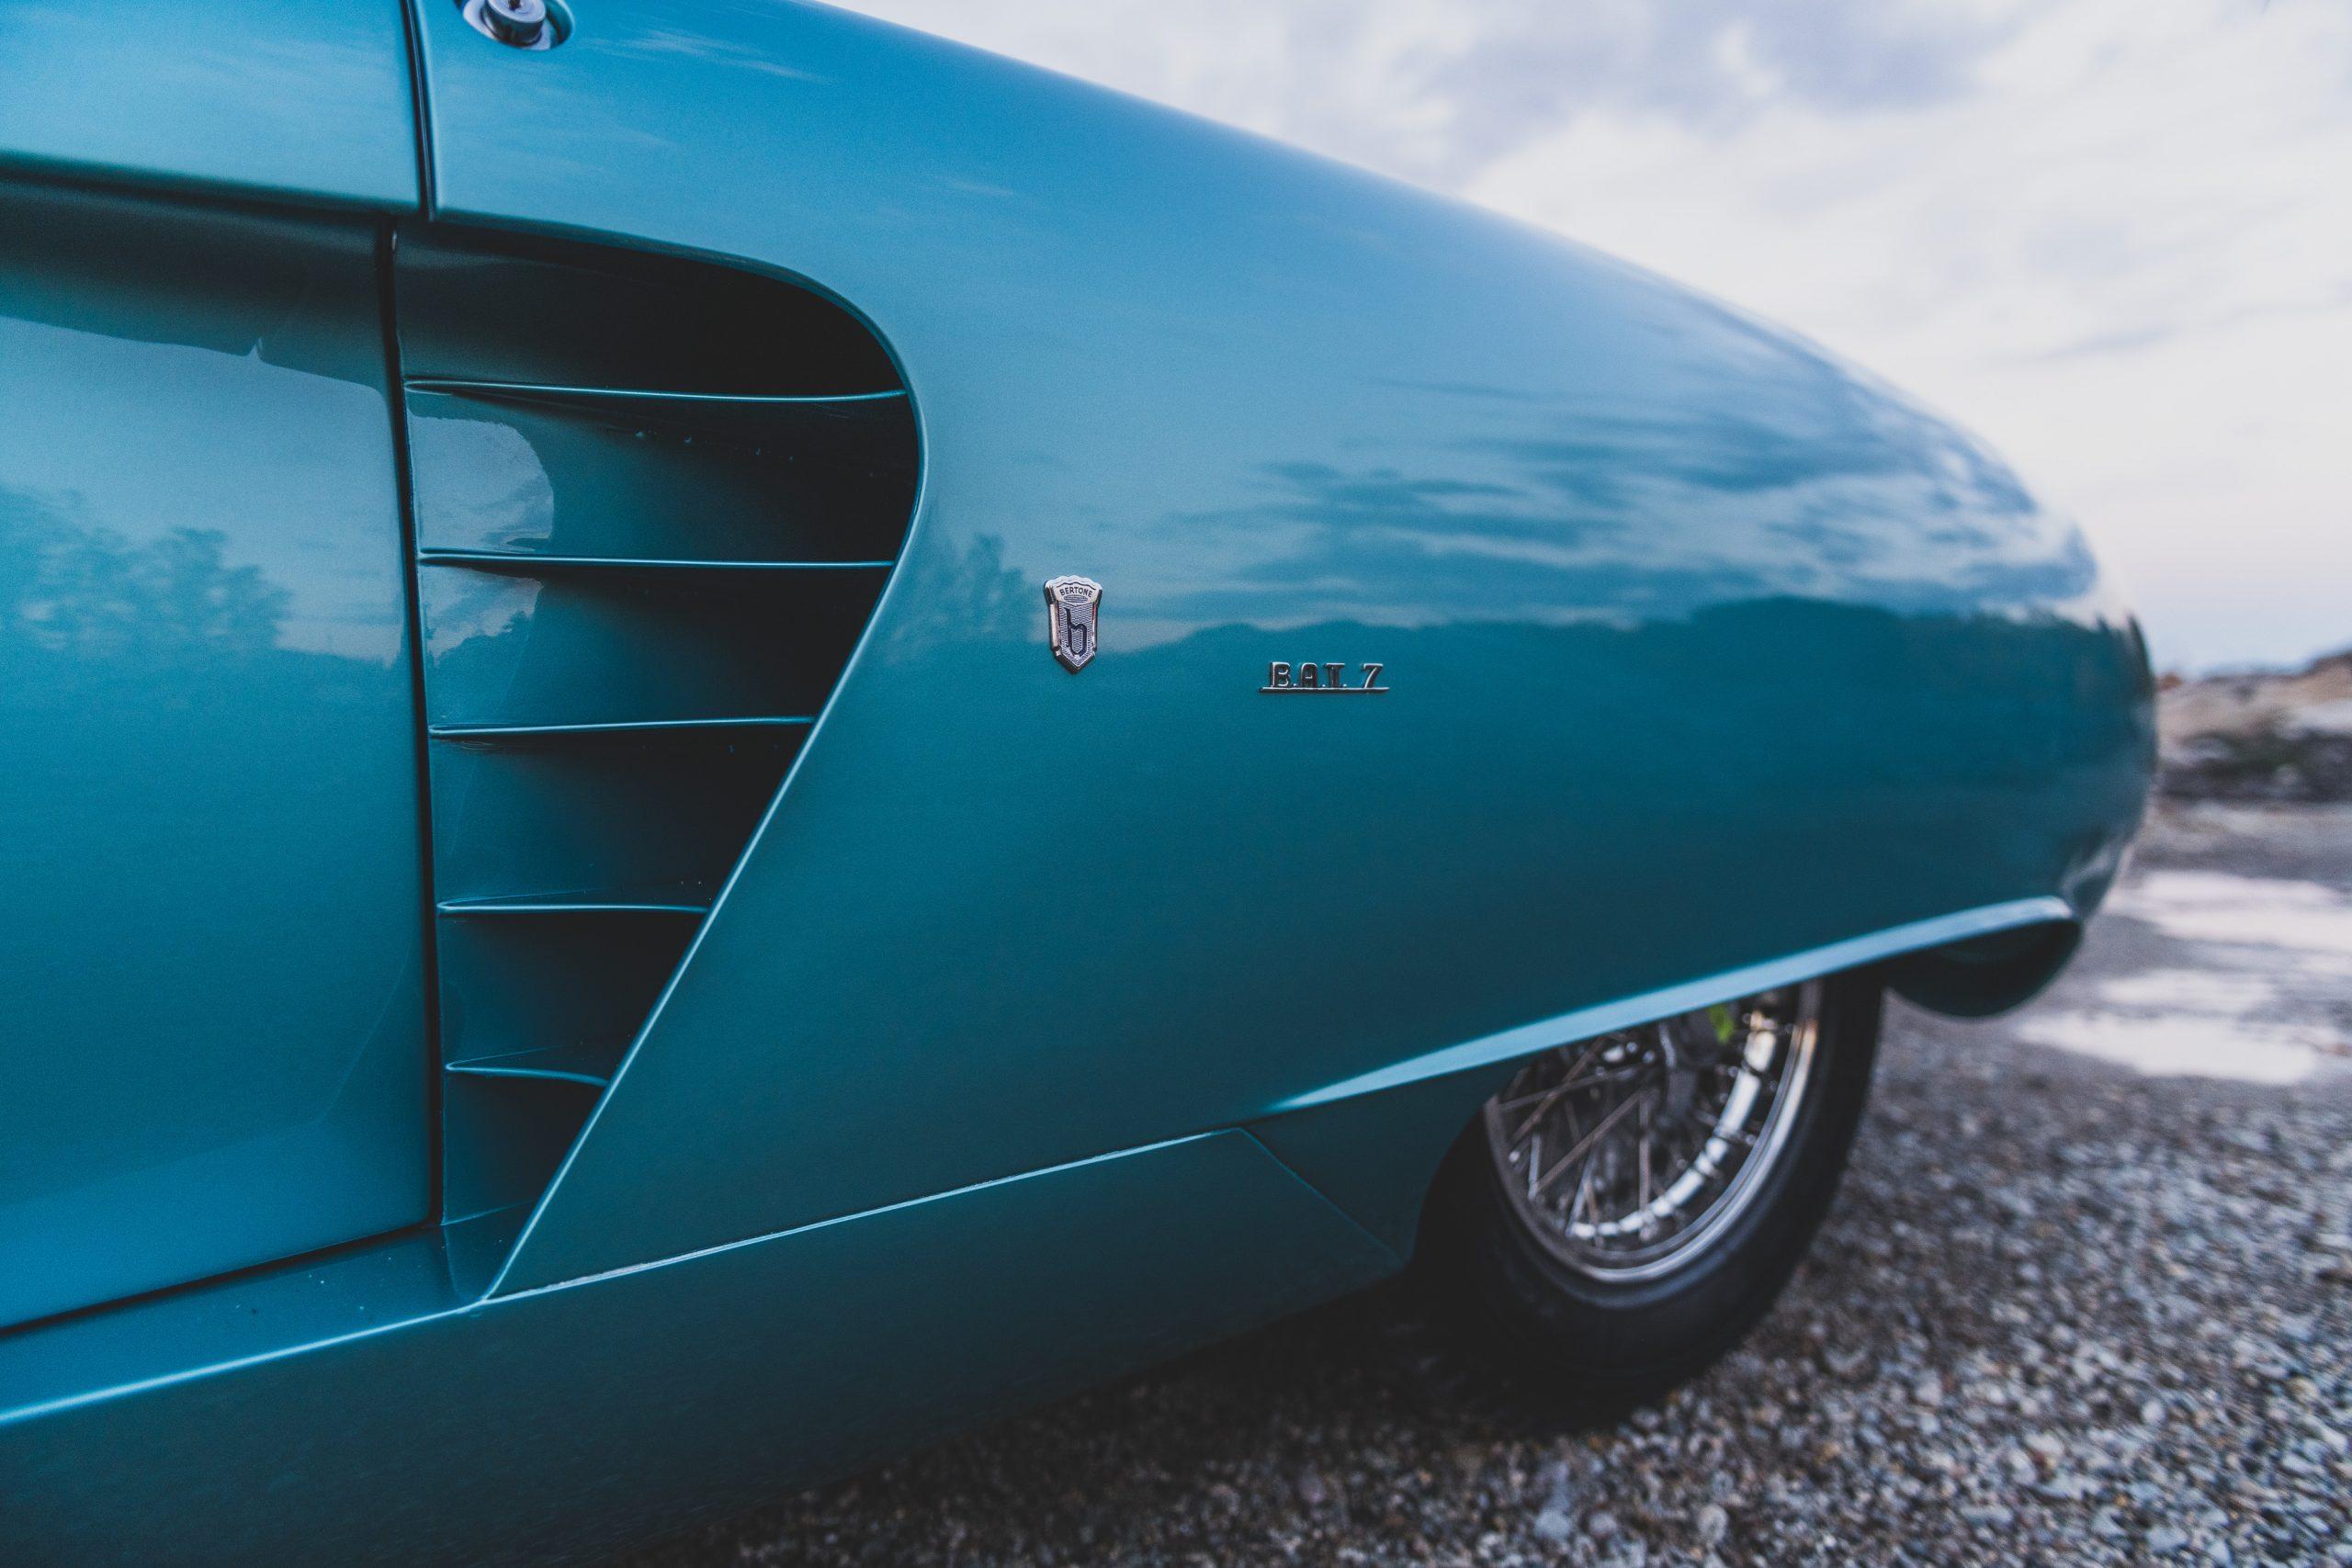 Alfa Romeo Berlina Aerodinamica Tecnica side vents